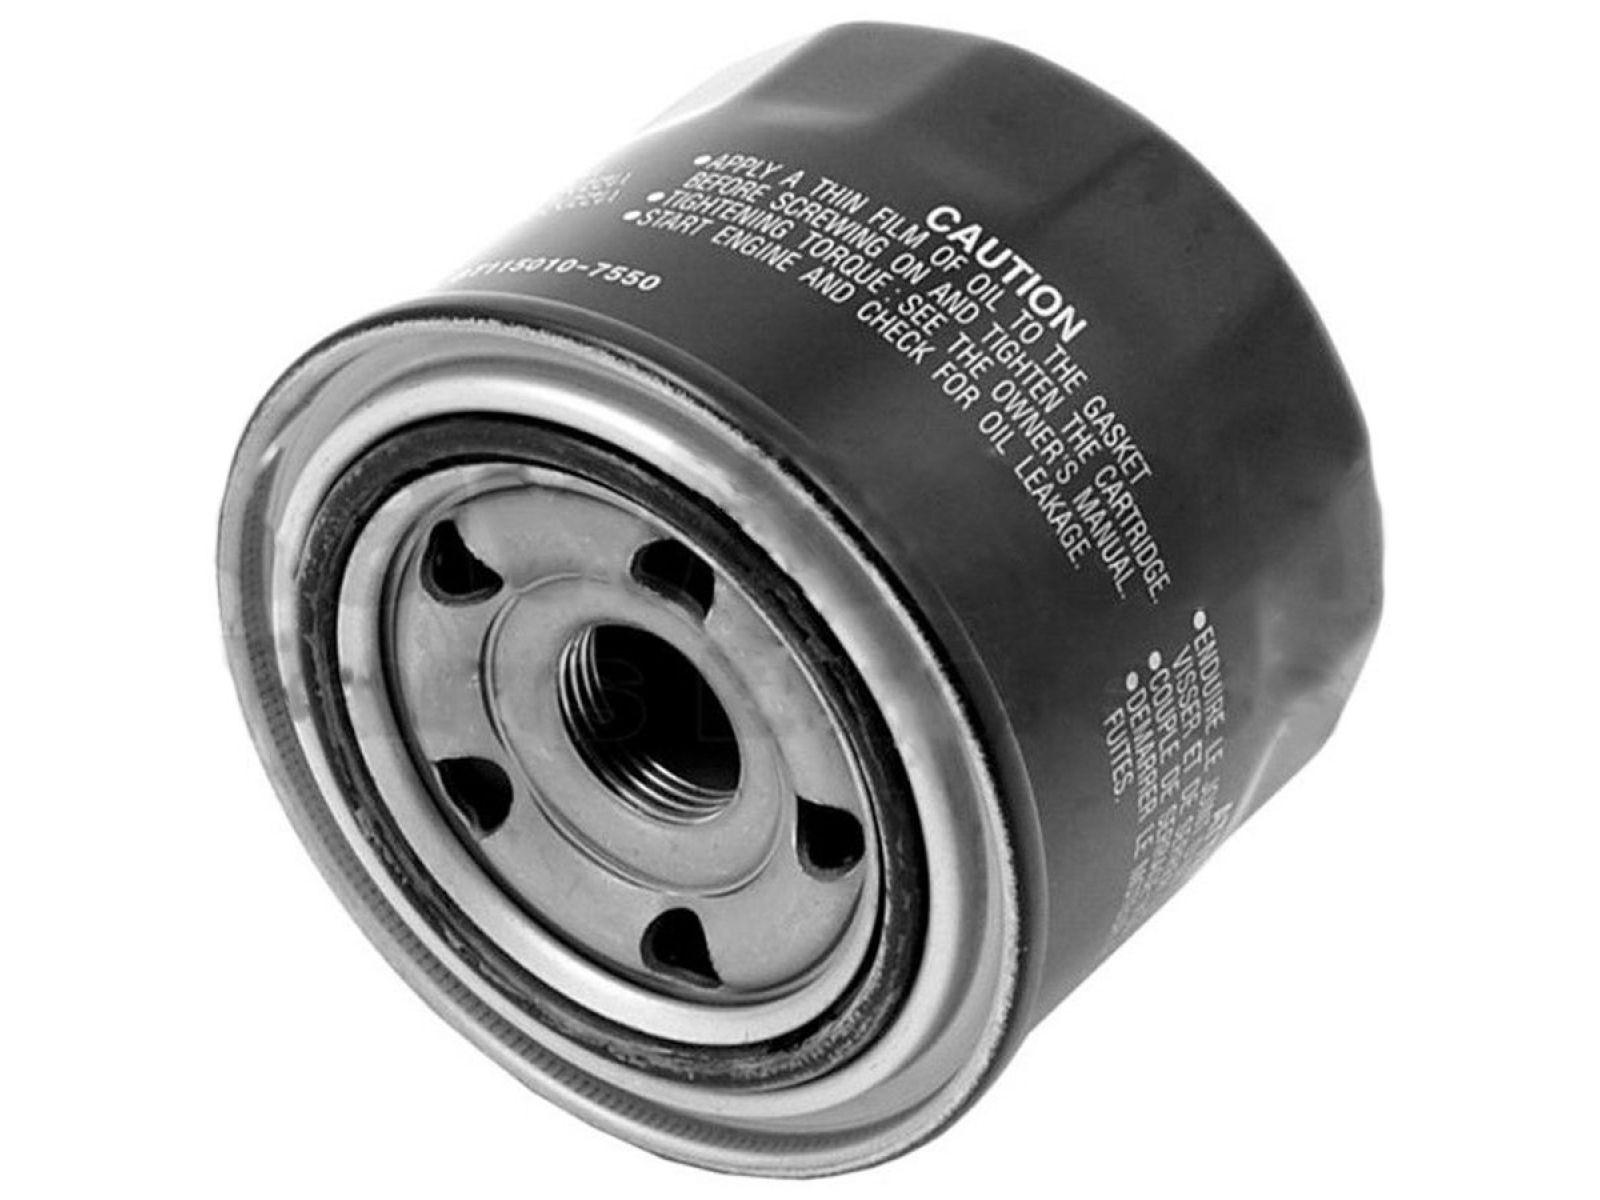 купить масляный фильтр для Kawasaki Ninja H2 15 17 Ninja H2r 15 17